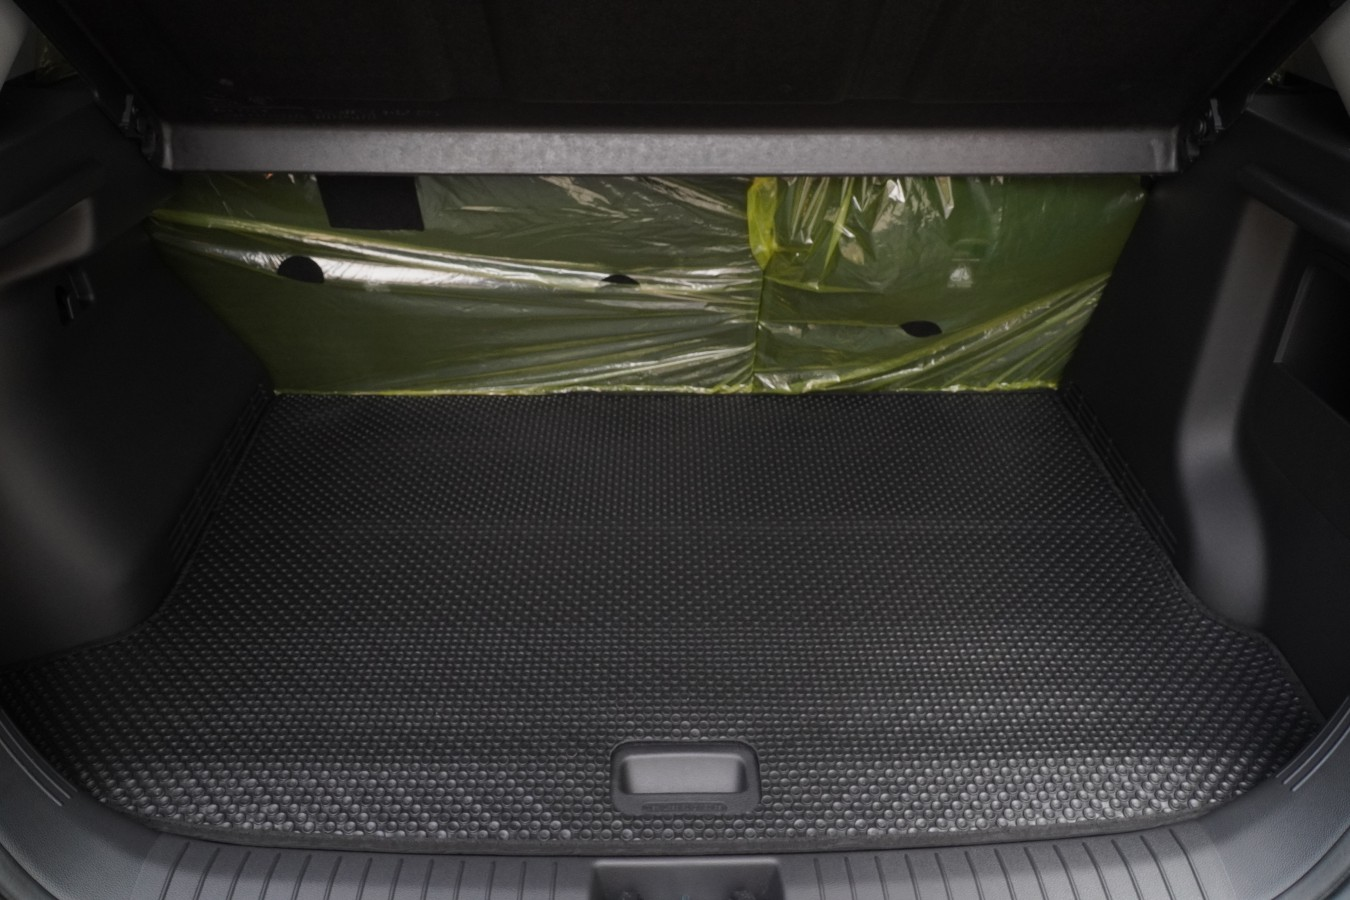 Thảm lót cốp Hyundai Kona